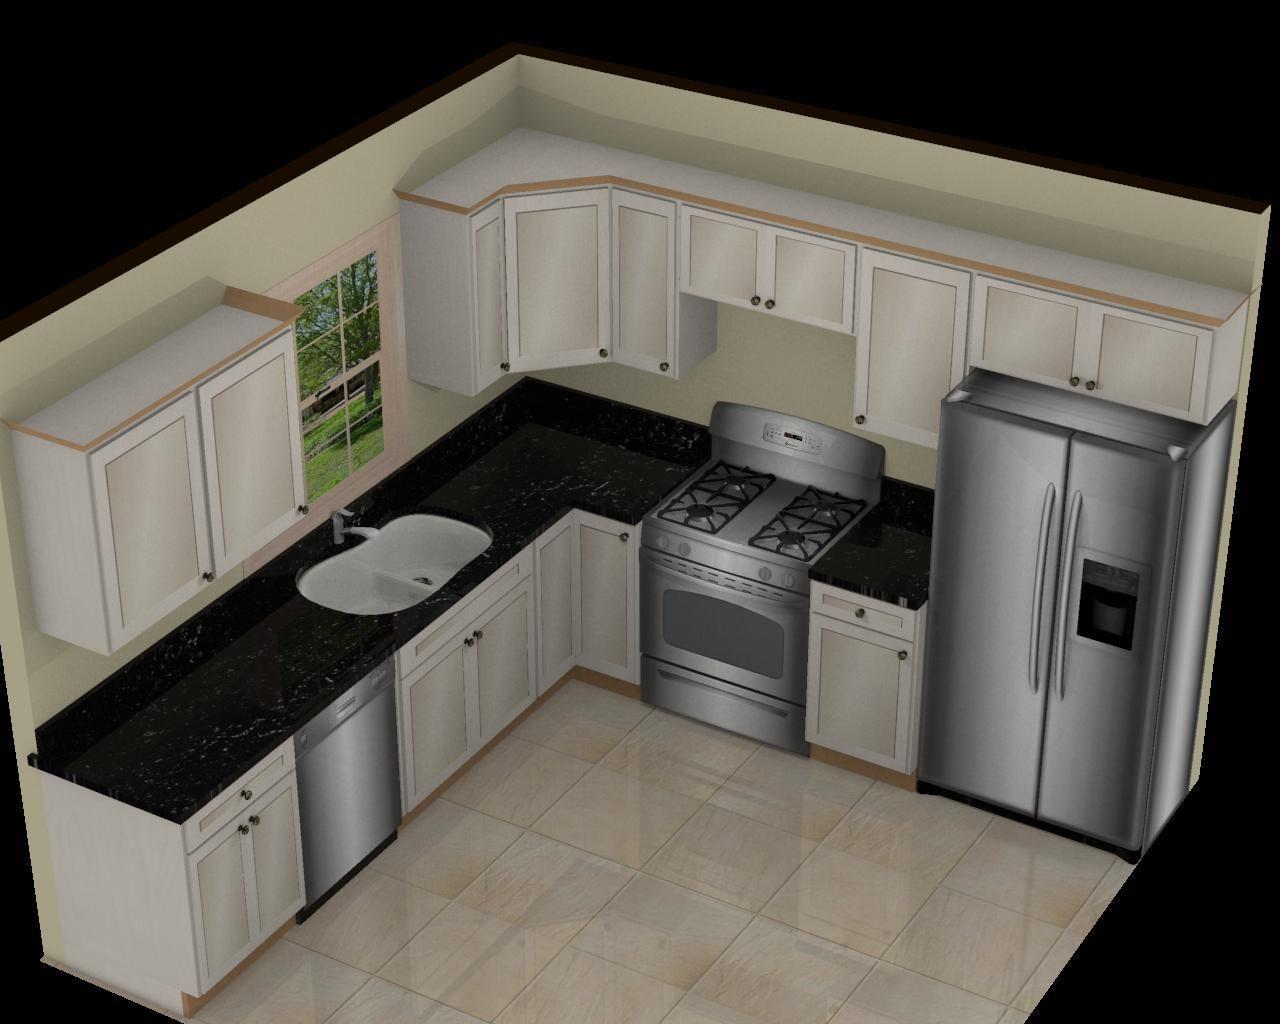 Wonderful Small Kitchen Layout Ideas With Similar To Original Design Get Rid Of Window Small Kitchen Design Layout Small Kitchen Layouts Modern Kitchen Design